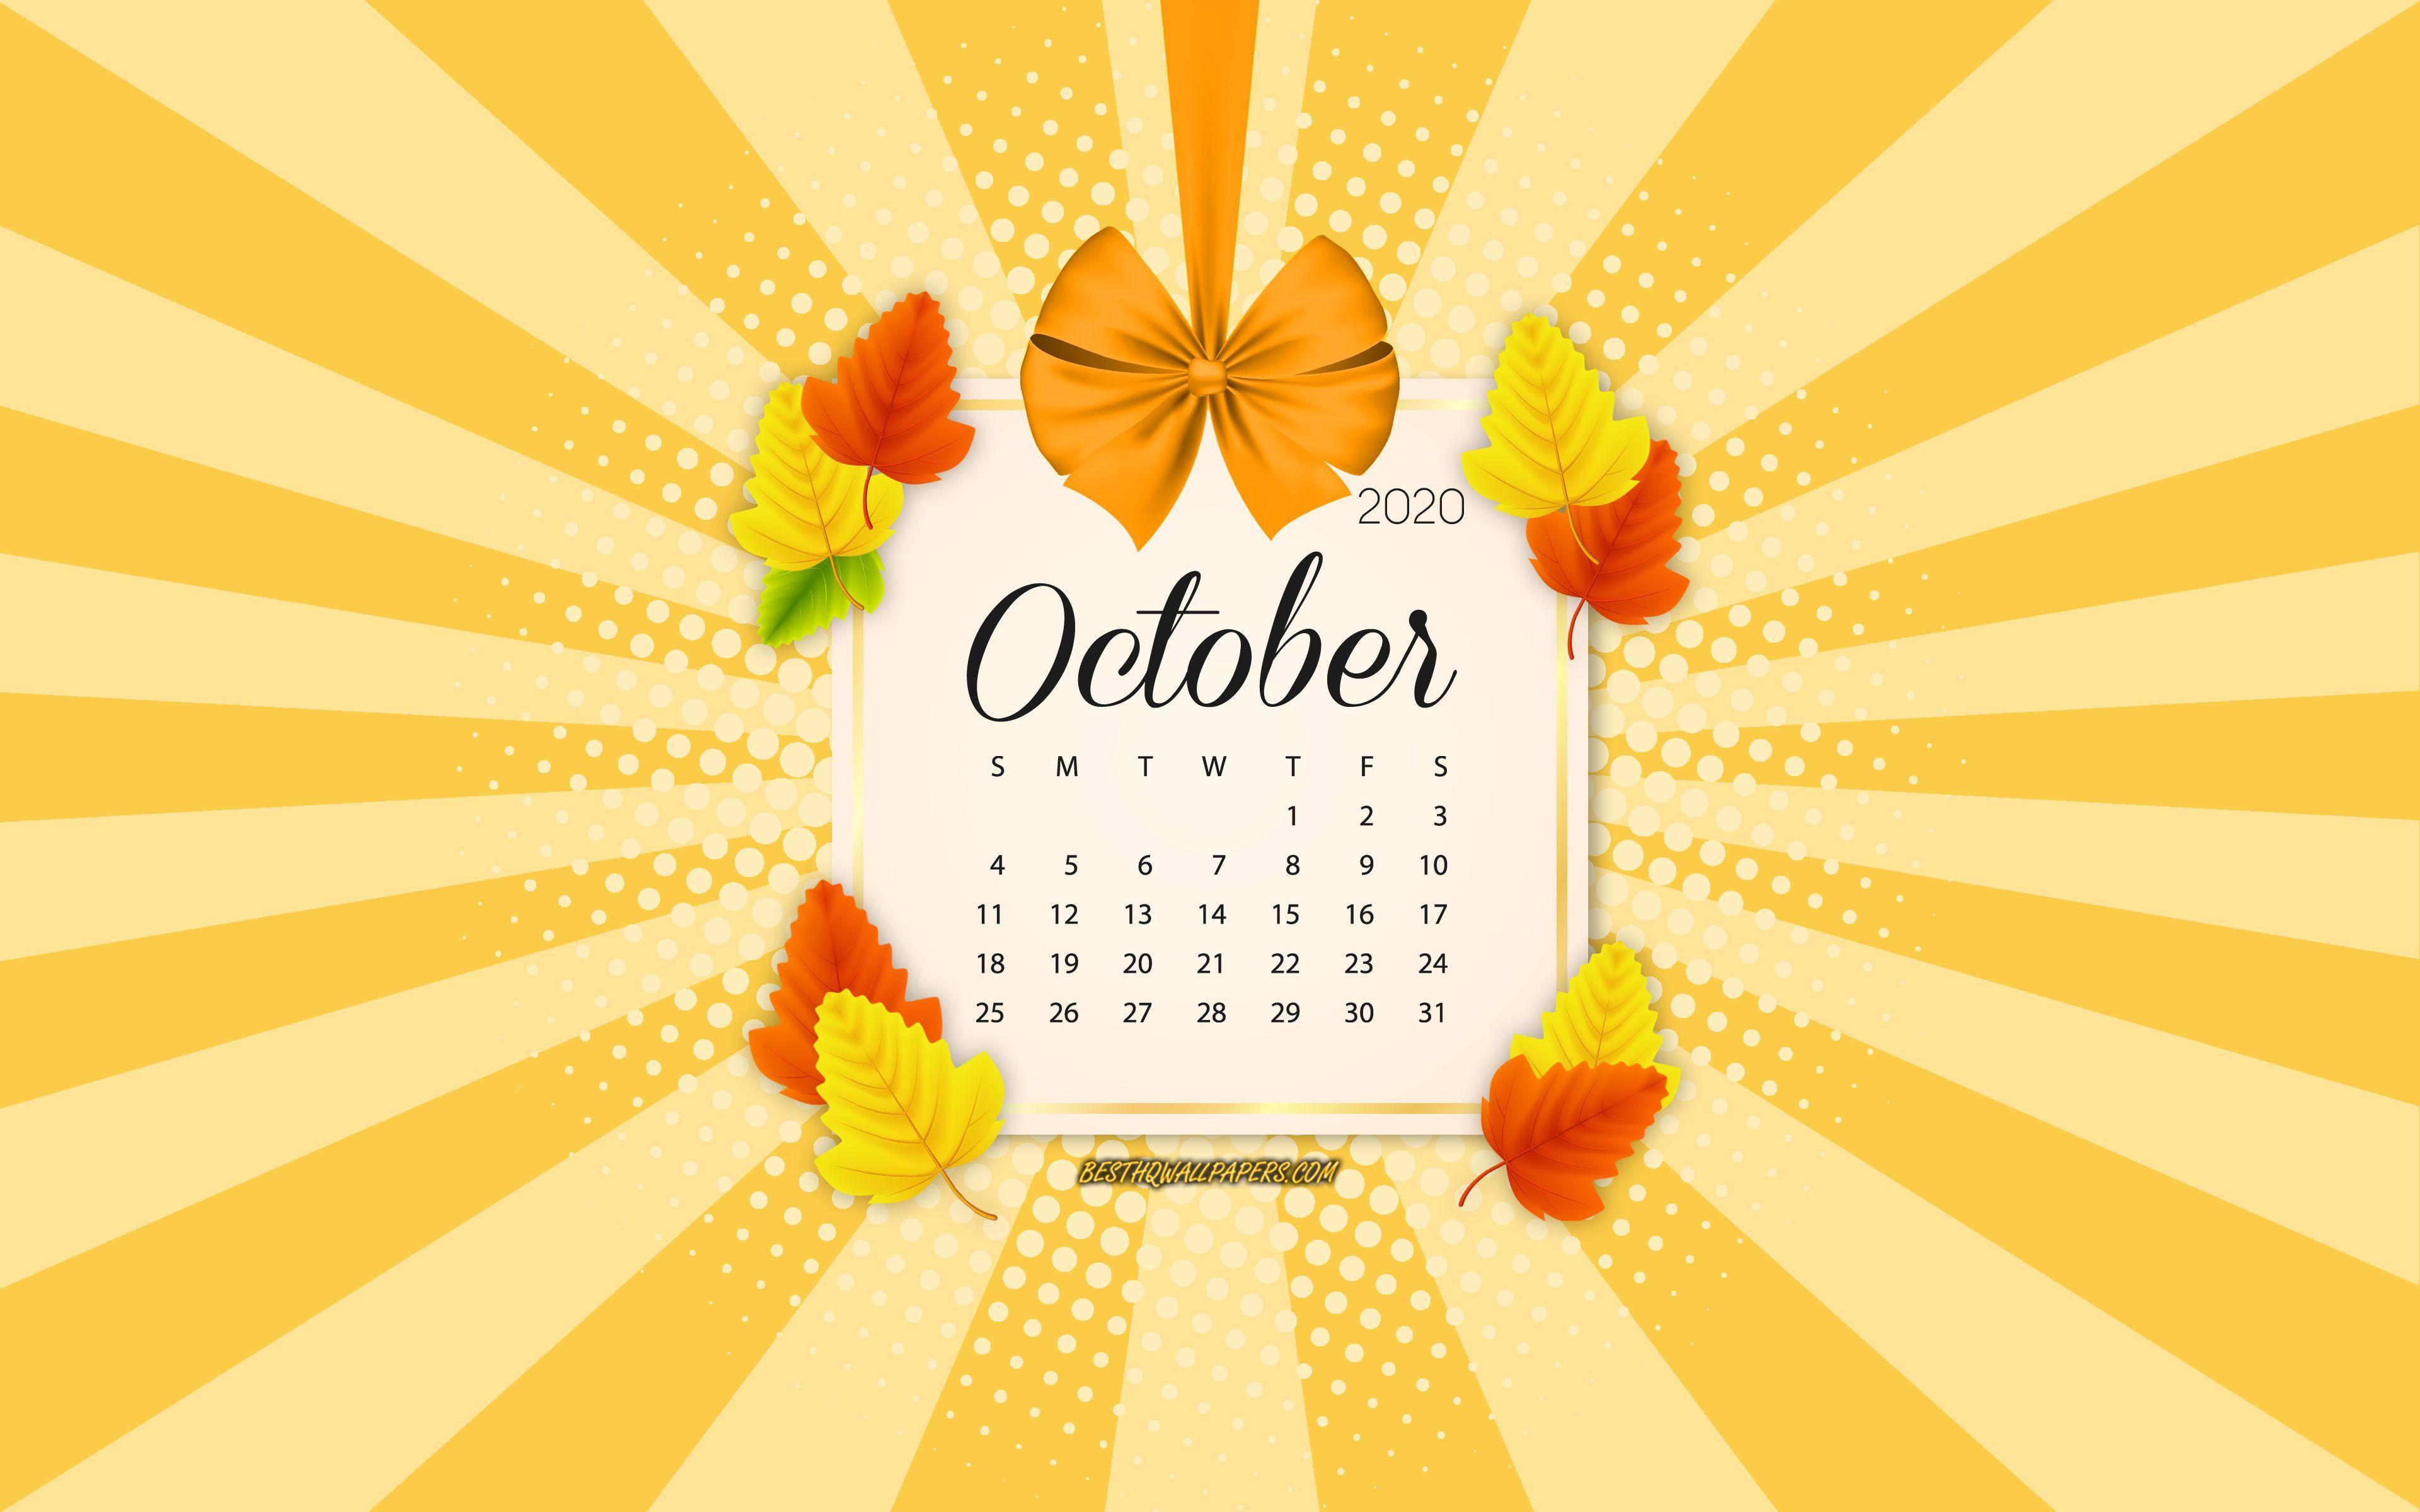 October 2020 Calendar Wallpapers Top Free October 2020 Calendar Backgrounds Wallpaperaccess